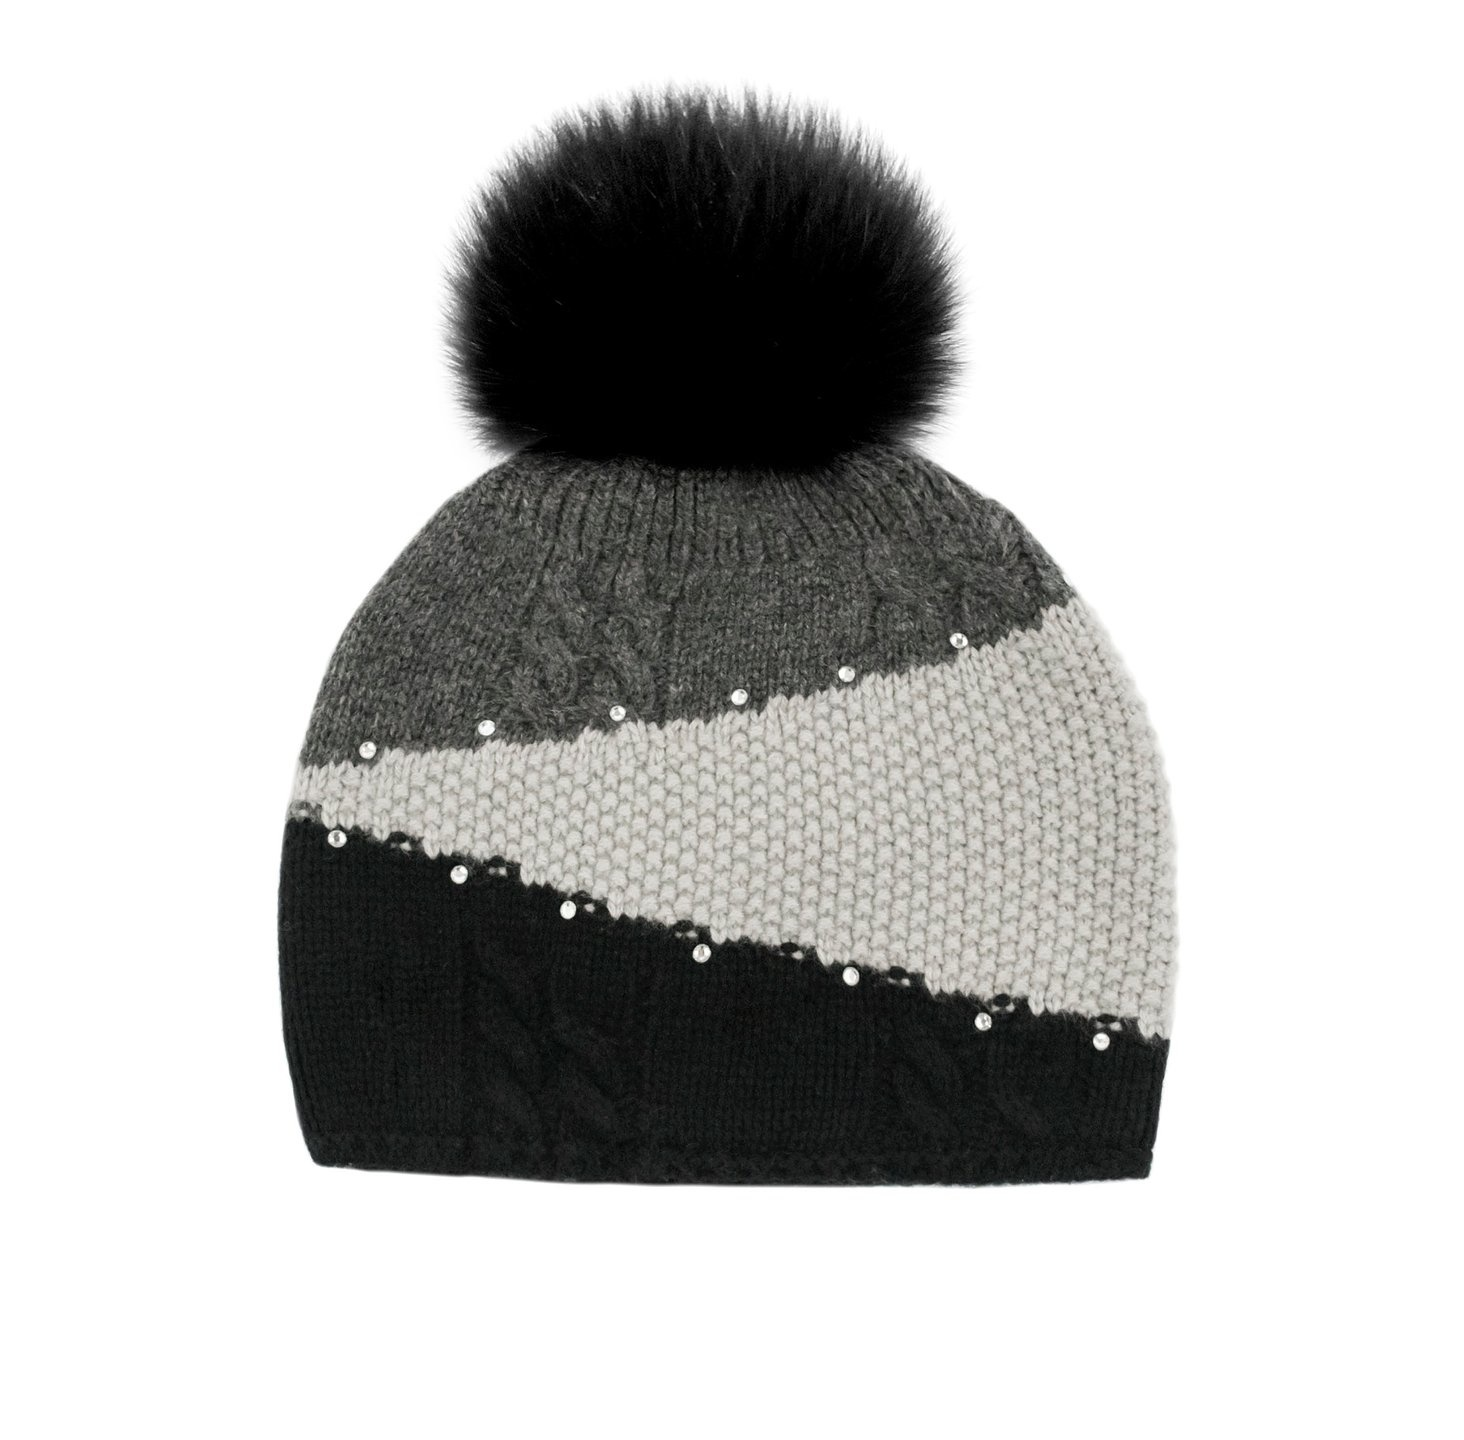 Black Colorblock Knitted Hat w/ Black Fox Pom